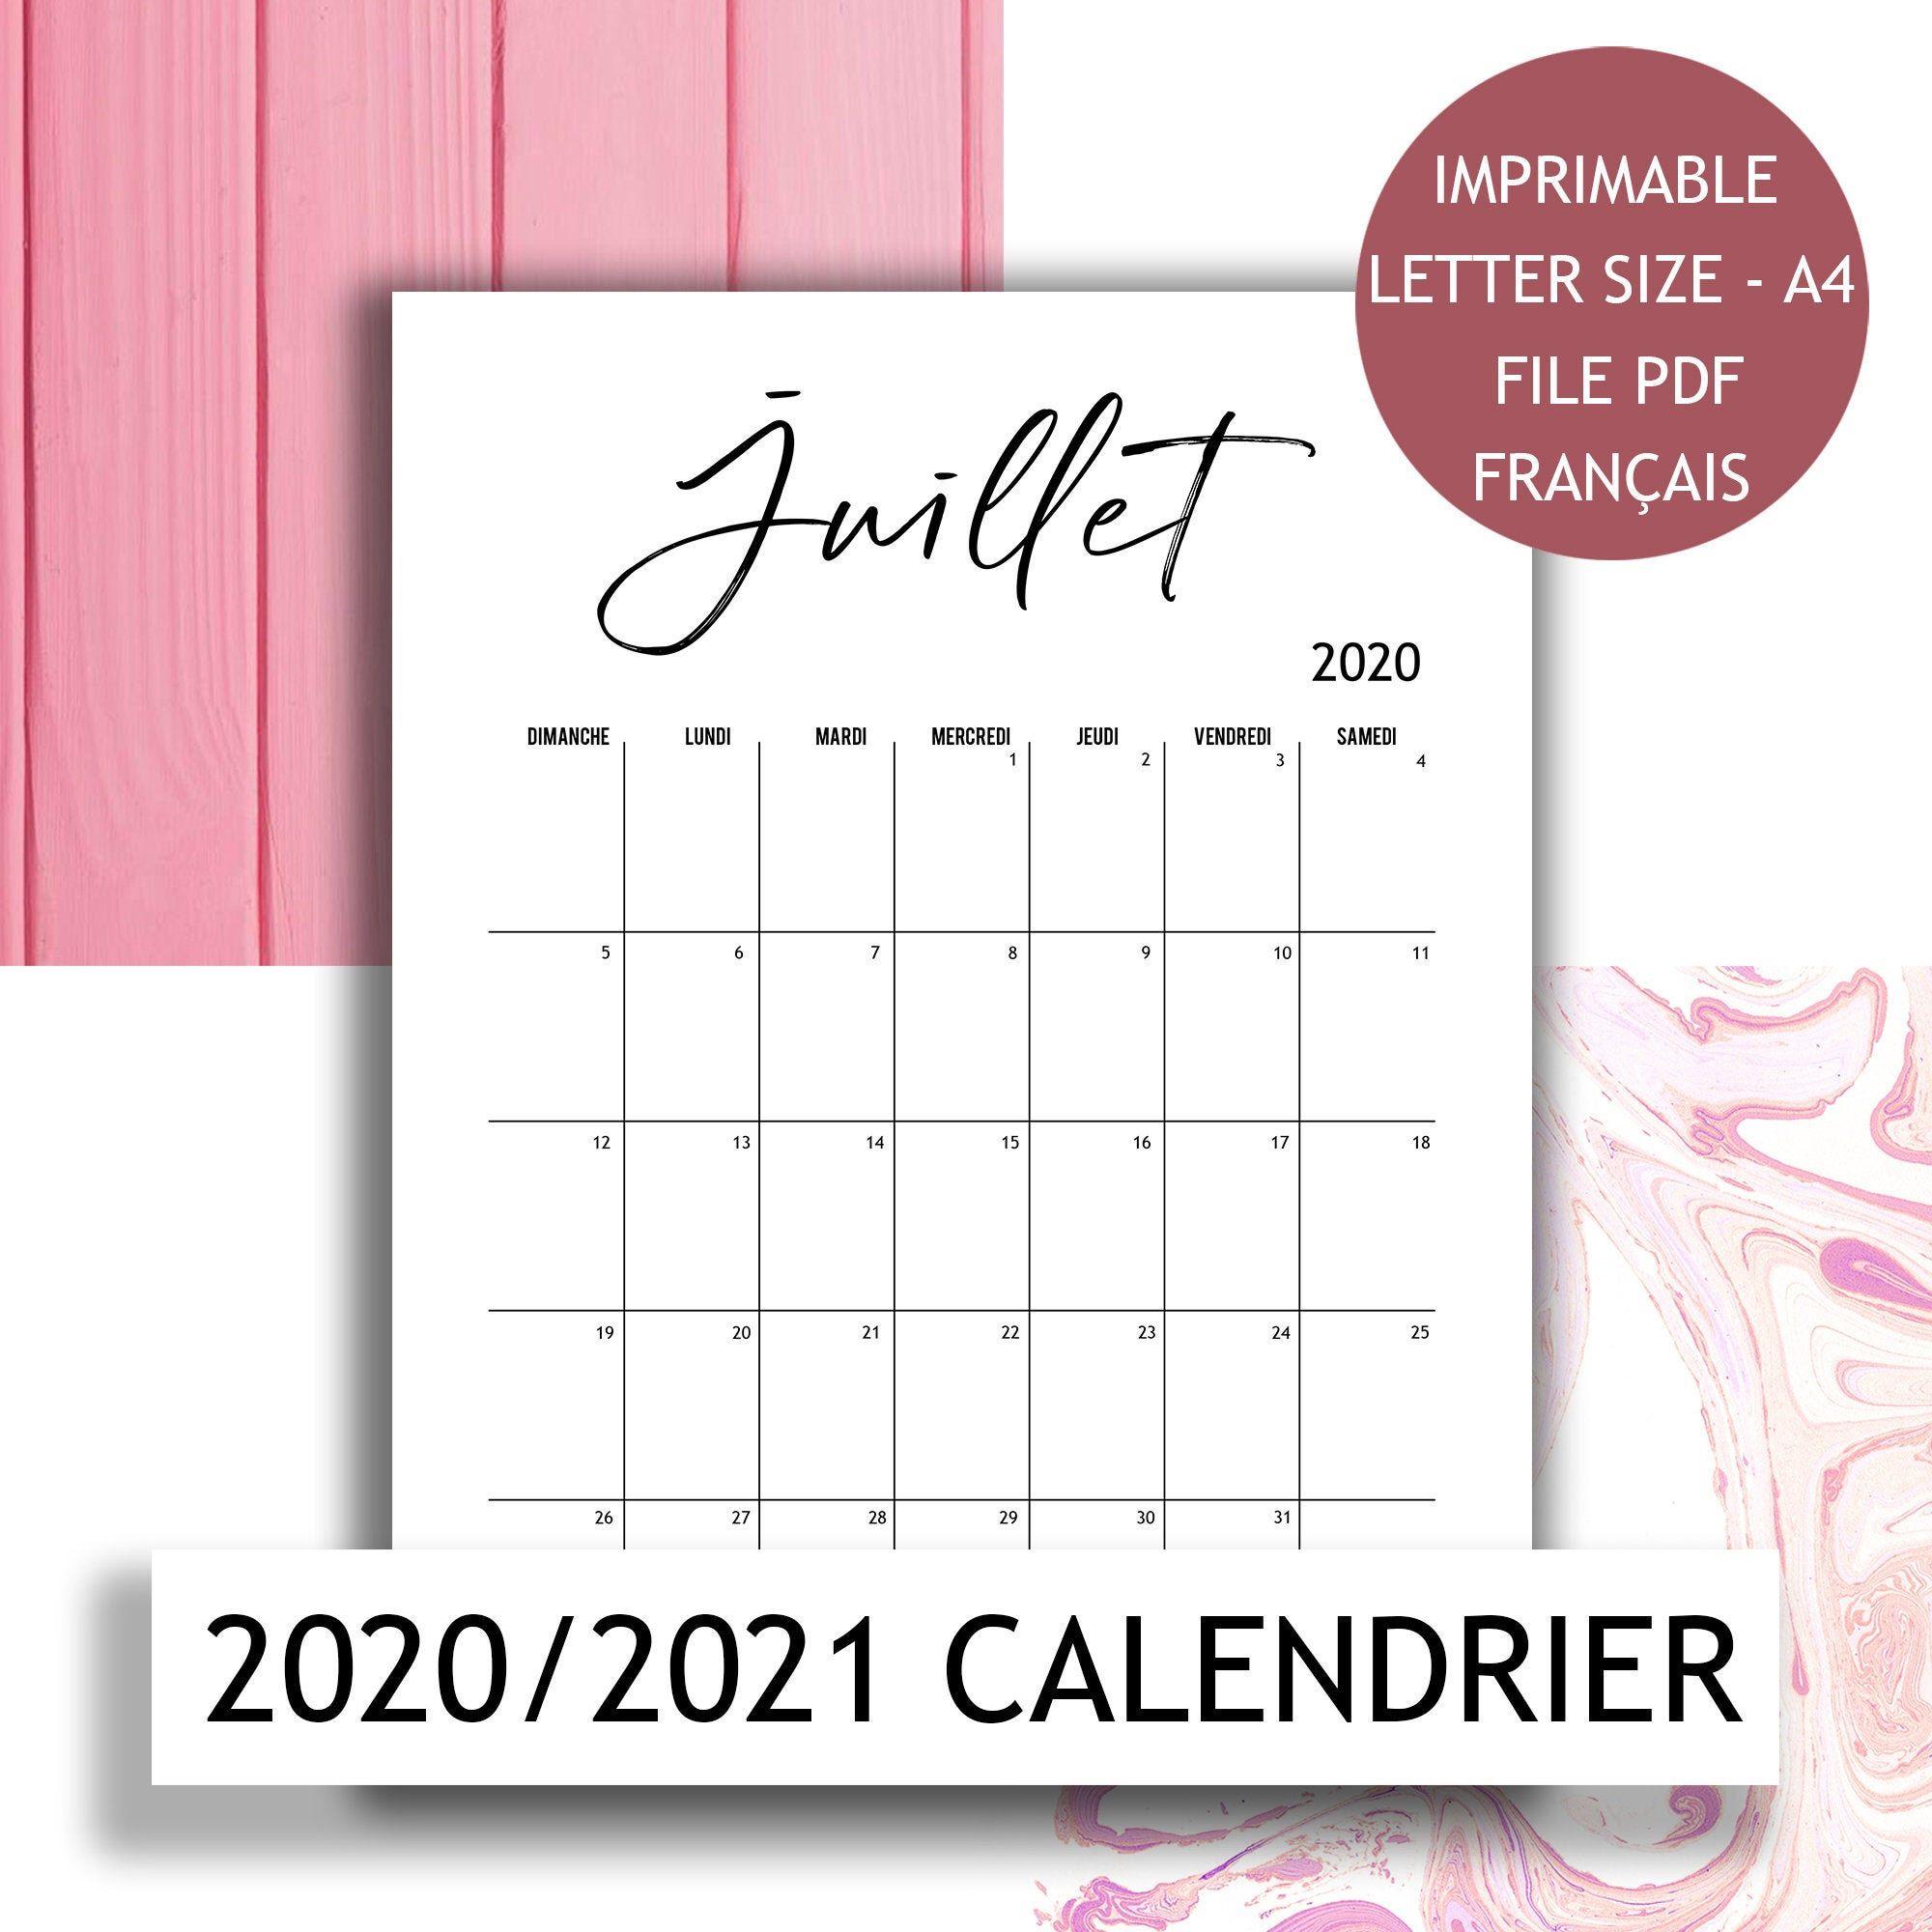 2020 Calendario stampabile calendario francese modello | Etsy nel